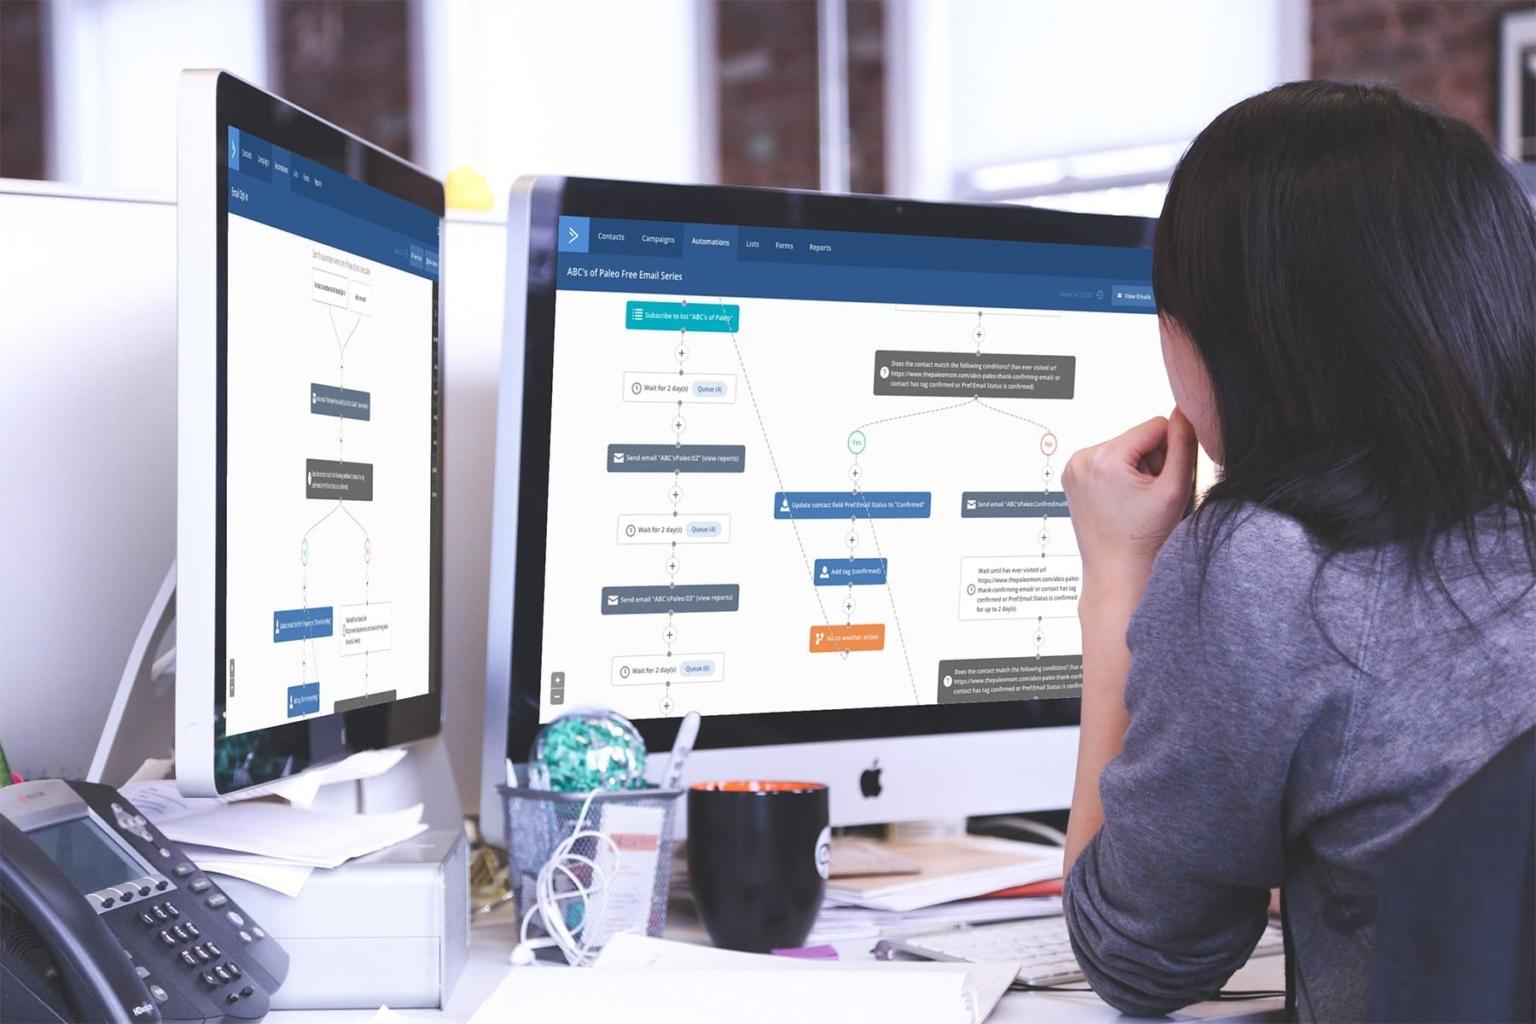 desktop computer displaying marketing automation screen